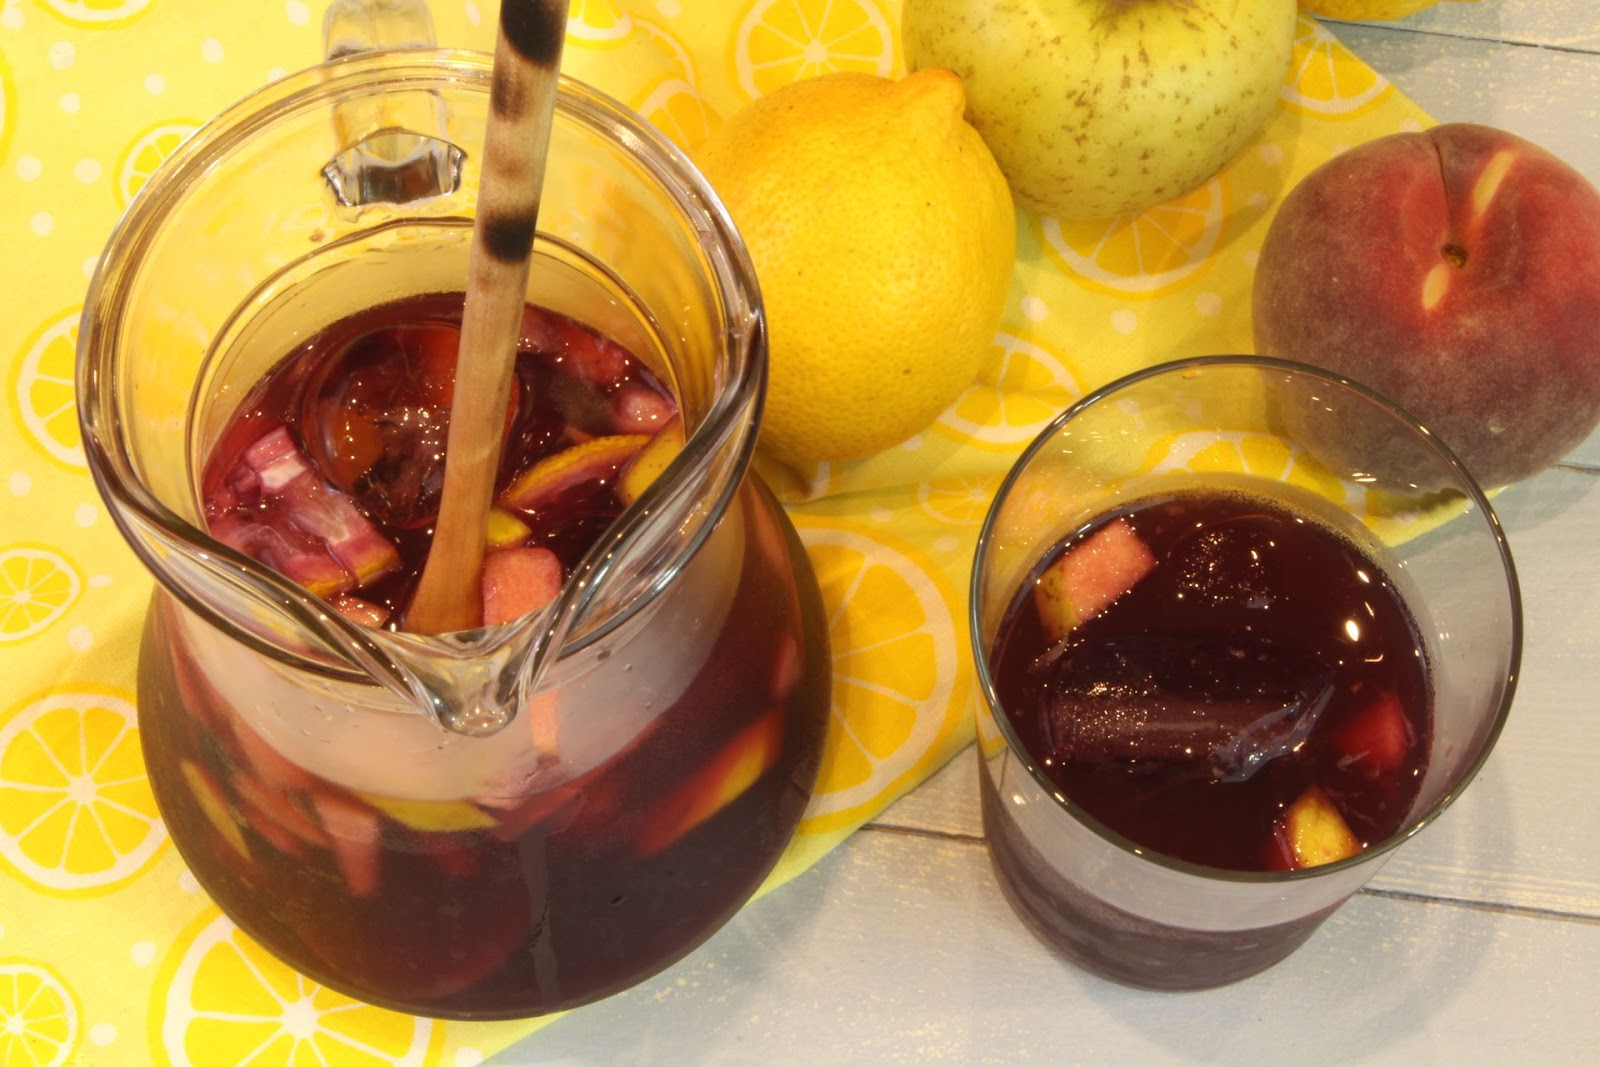 Receta de sangría de vino